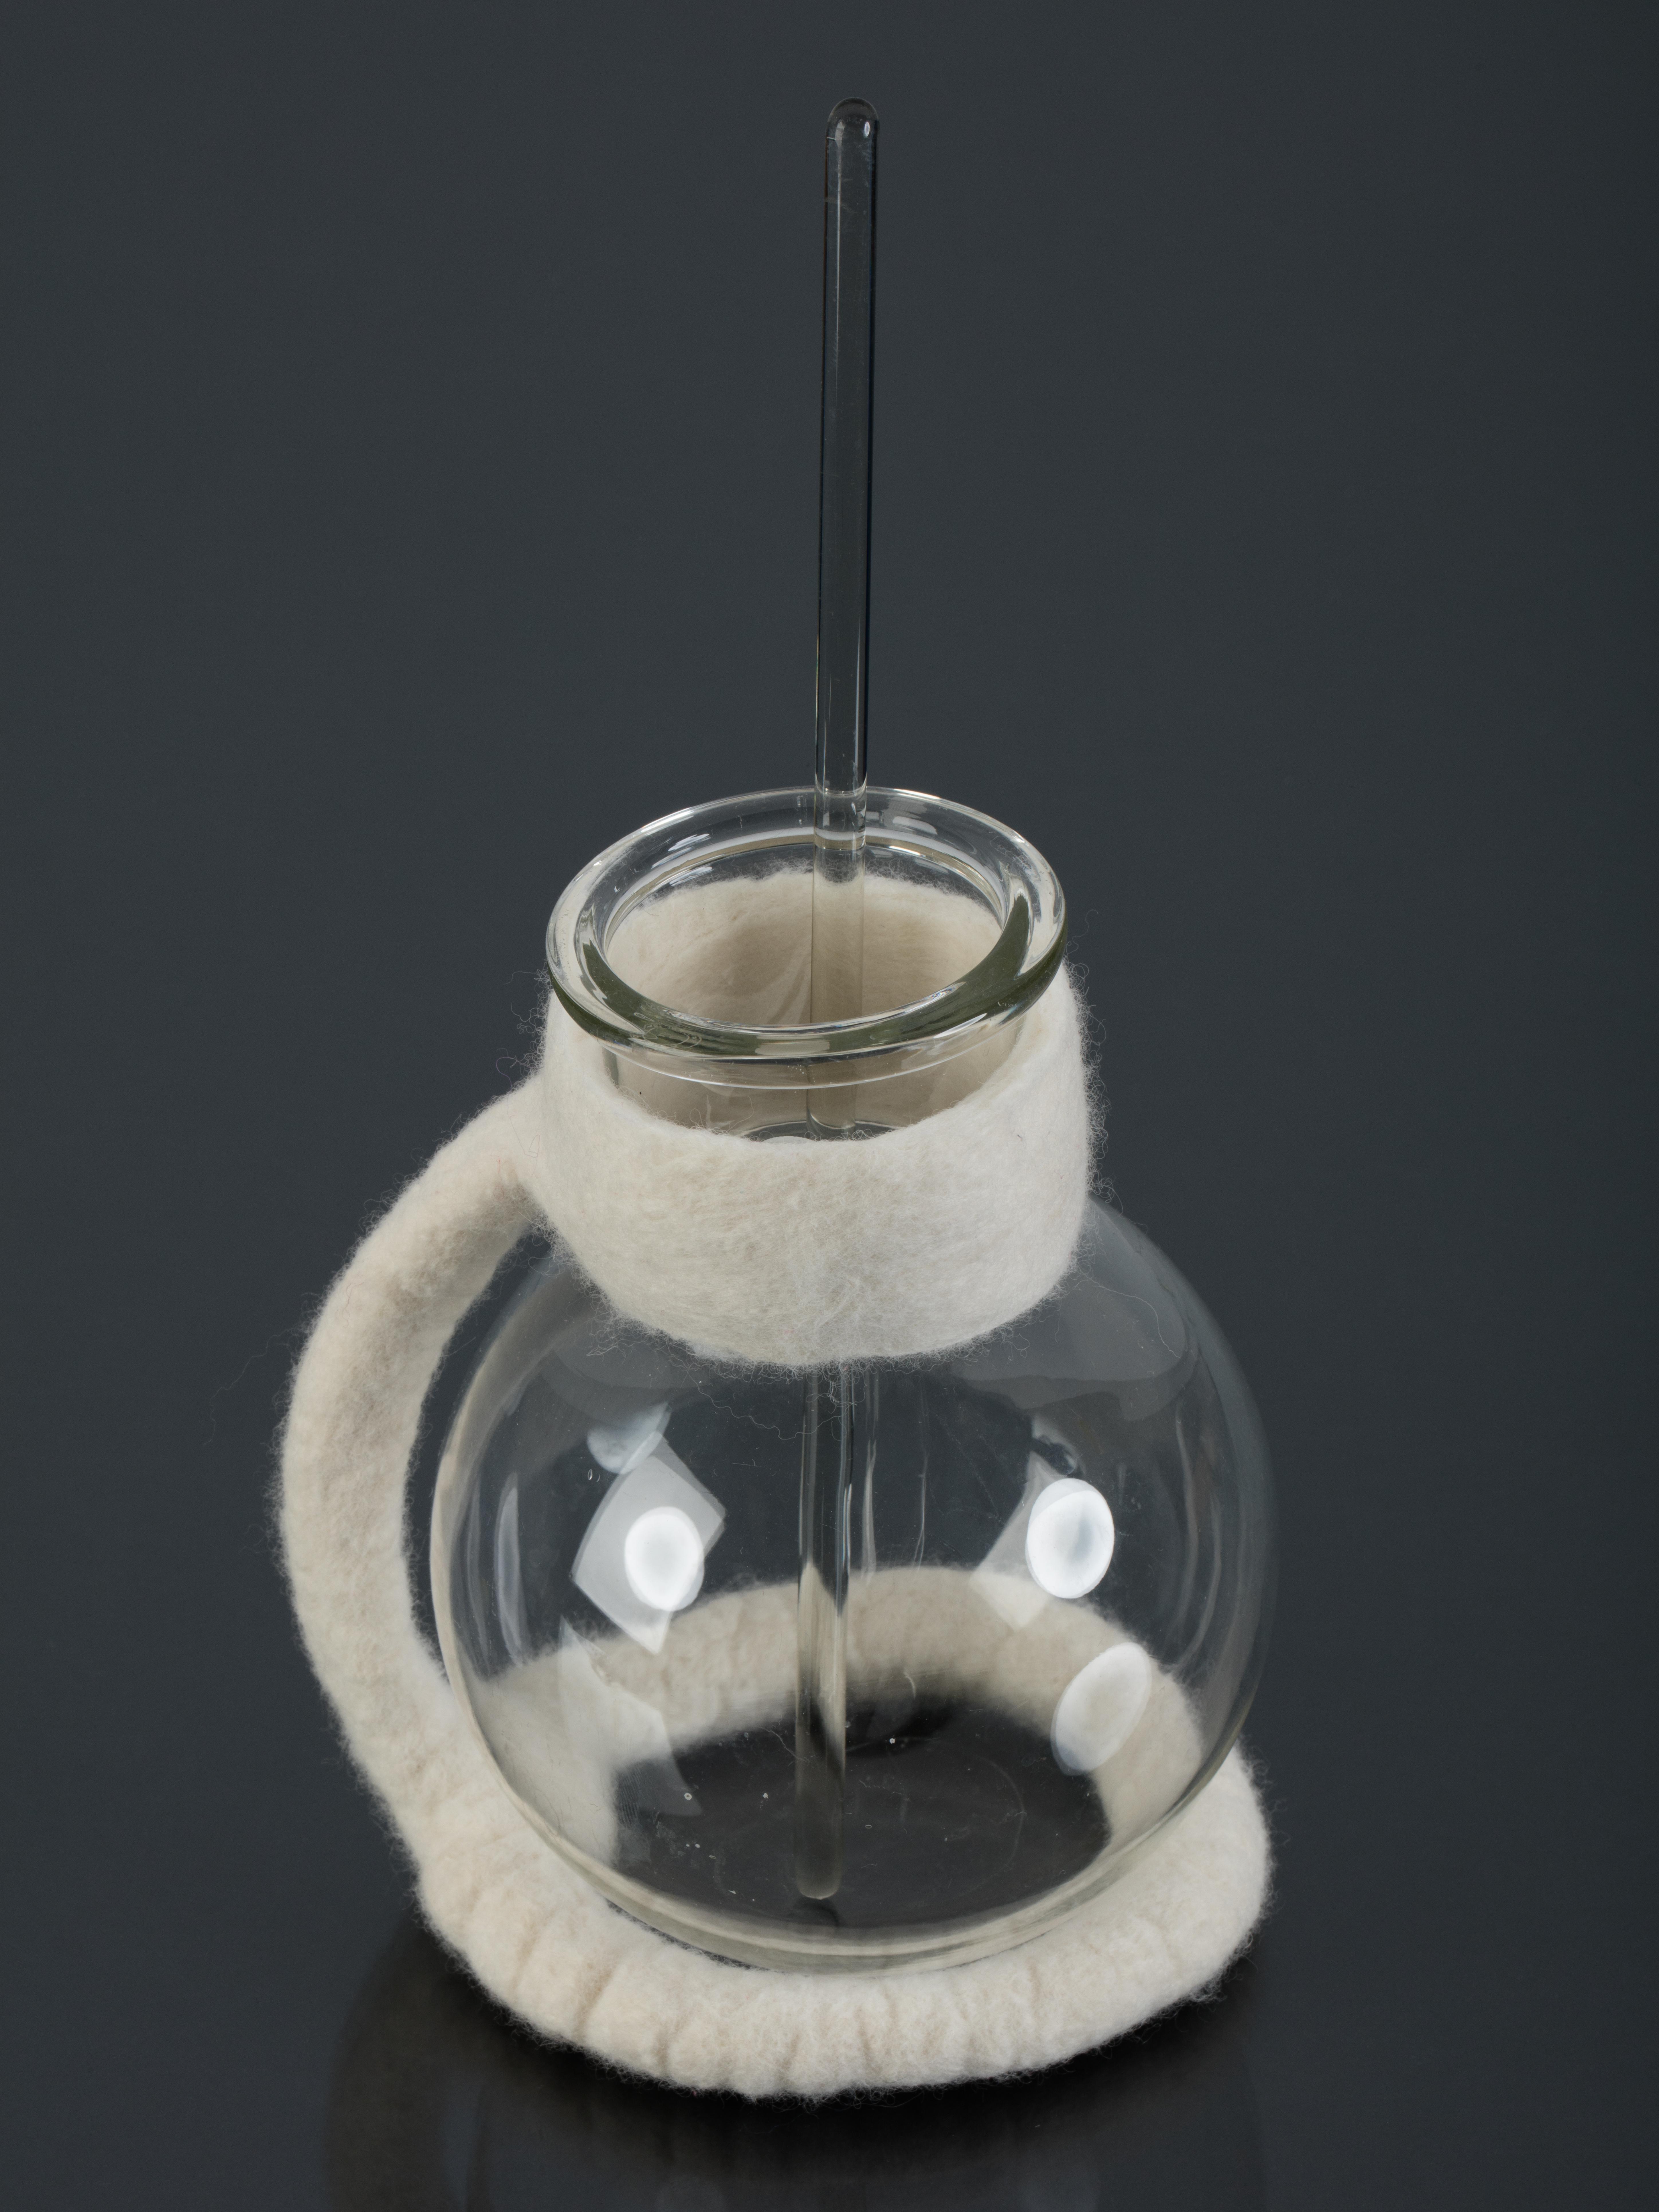 Felt and lab glass vessel